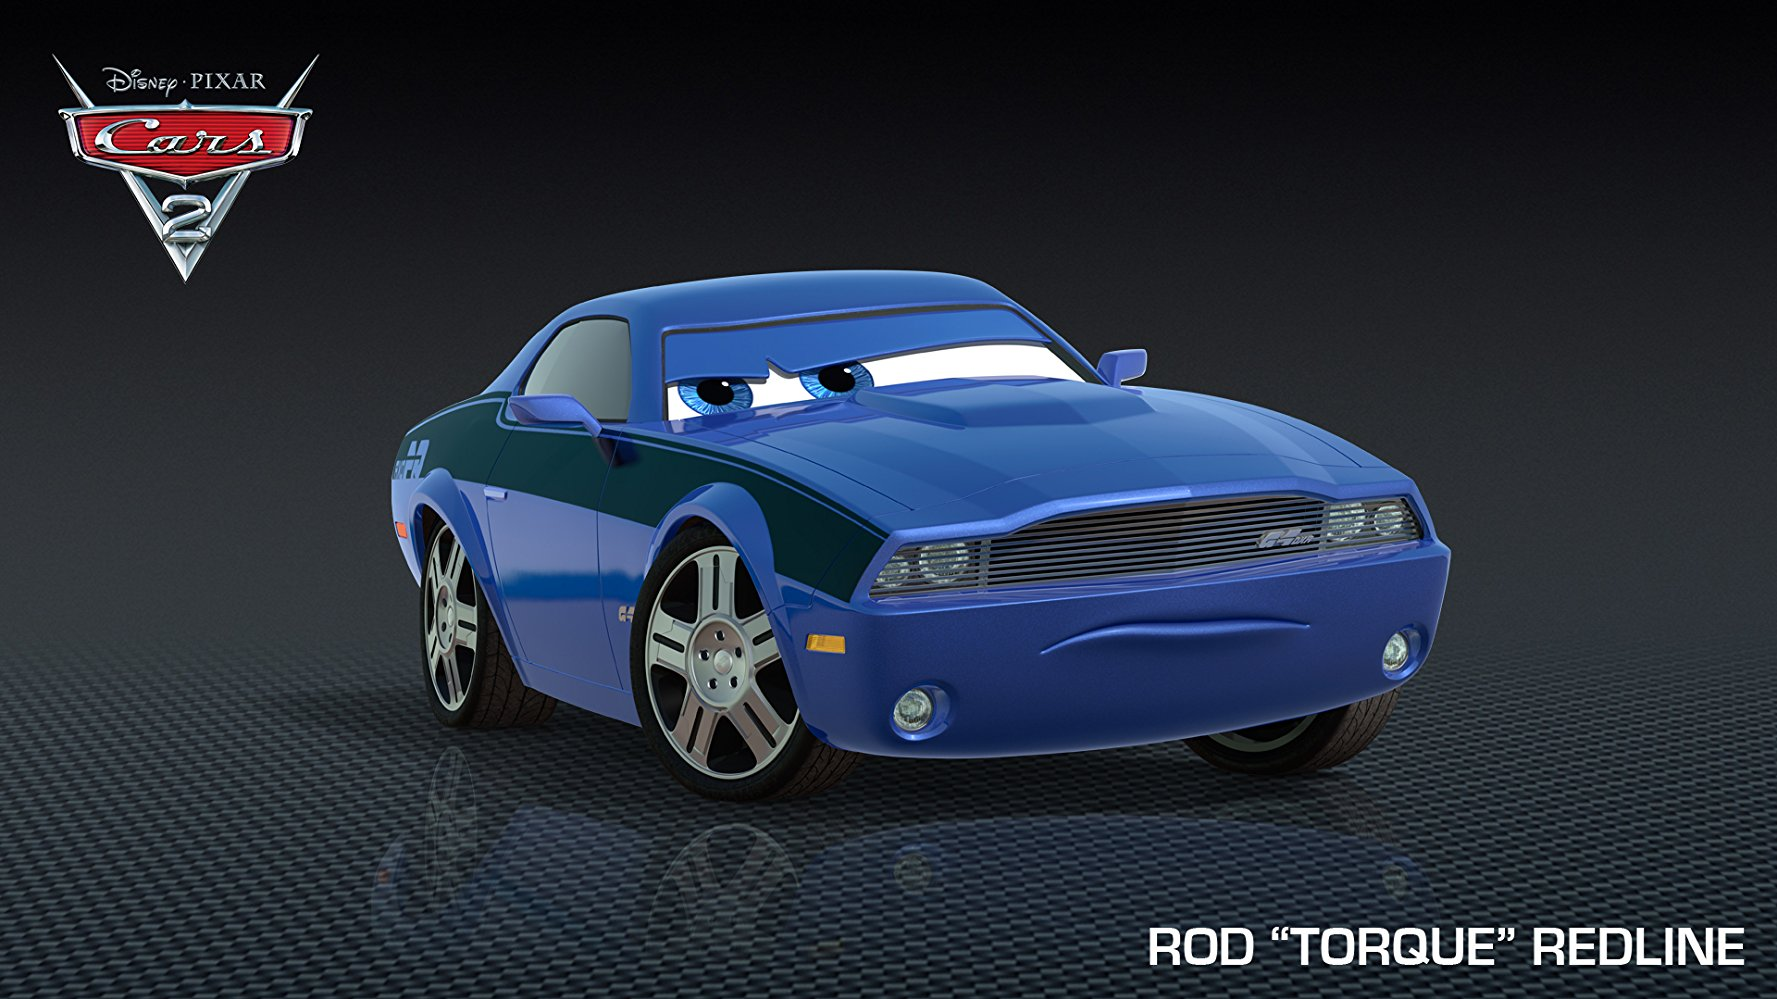 Rod 'Torque' Redline